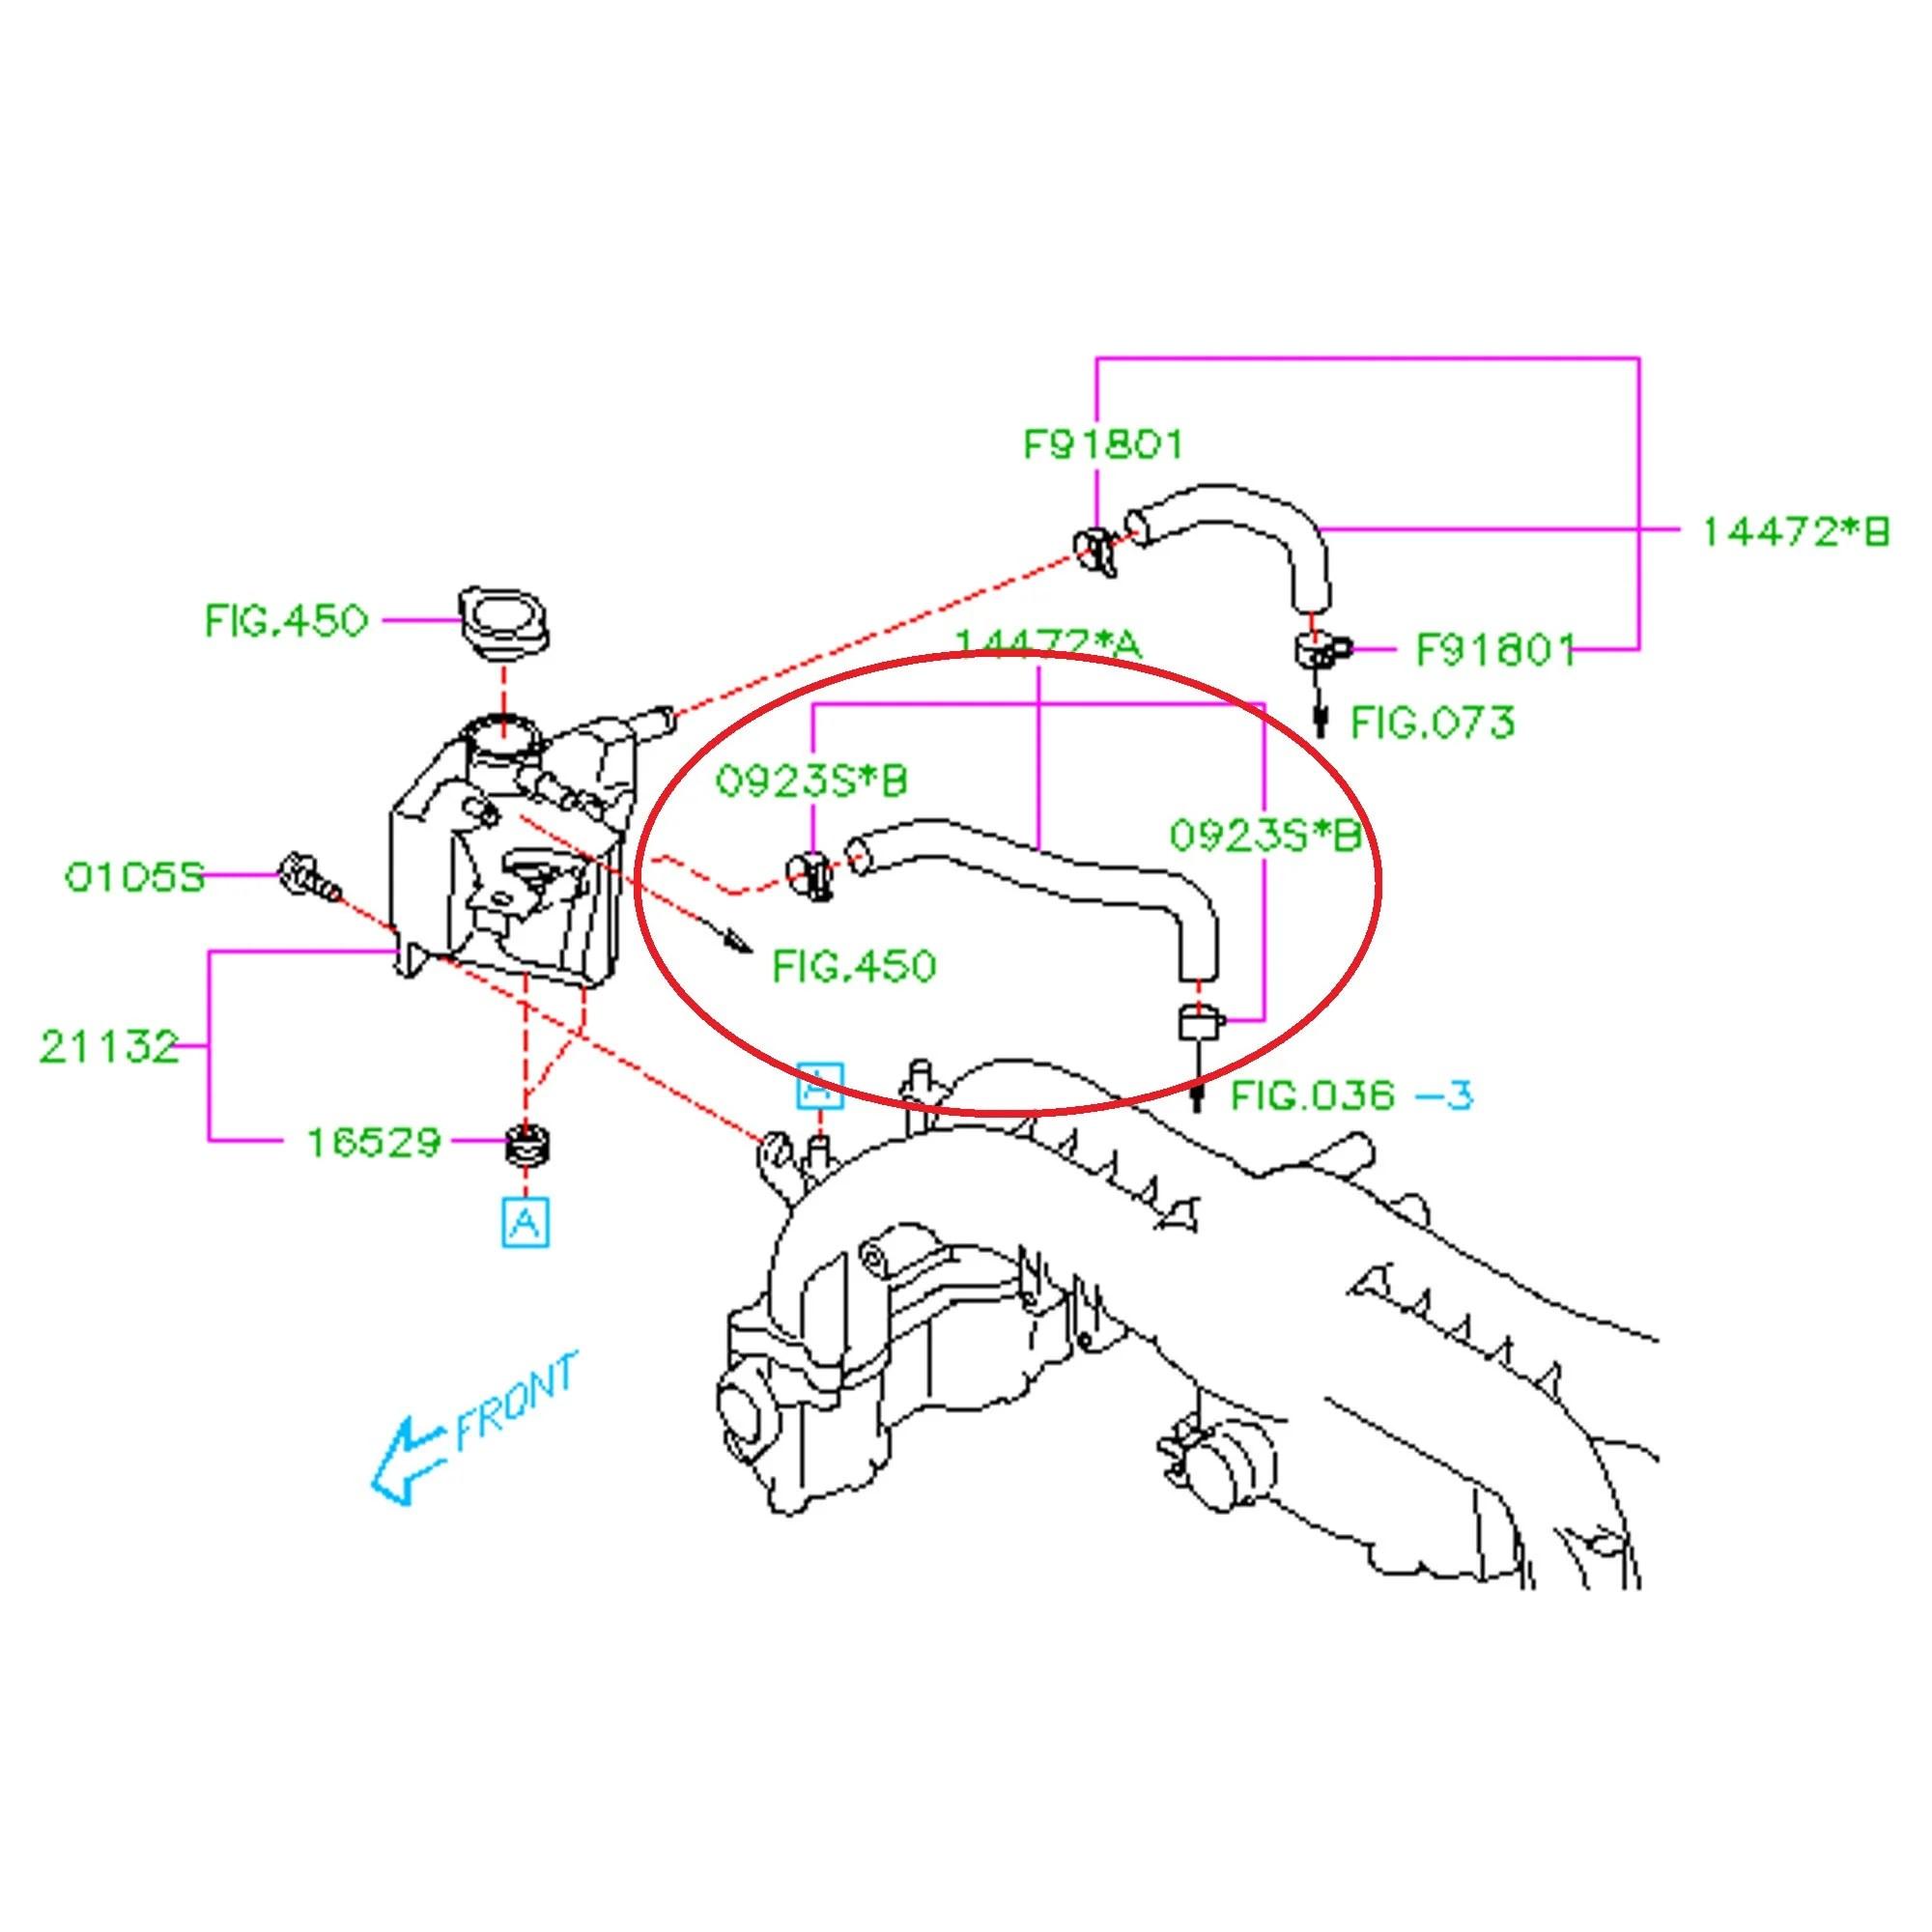 medium resolution of vacuum line diagram on 2004 subaru impreza wrx sti parts diagram subaru wrx wiring diagram 2002